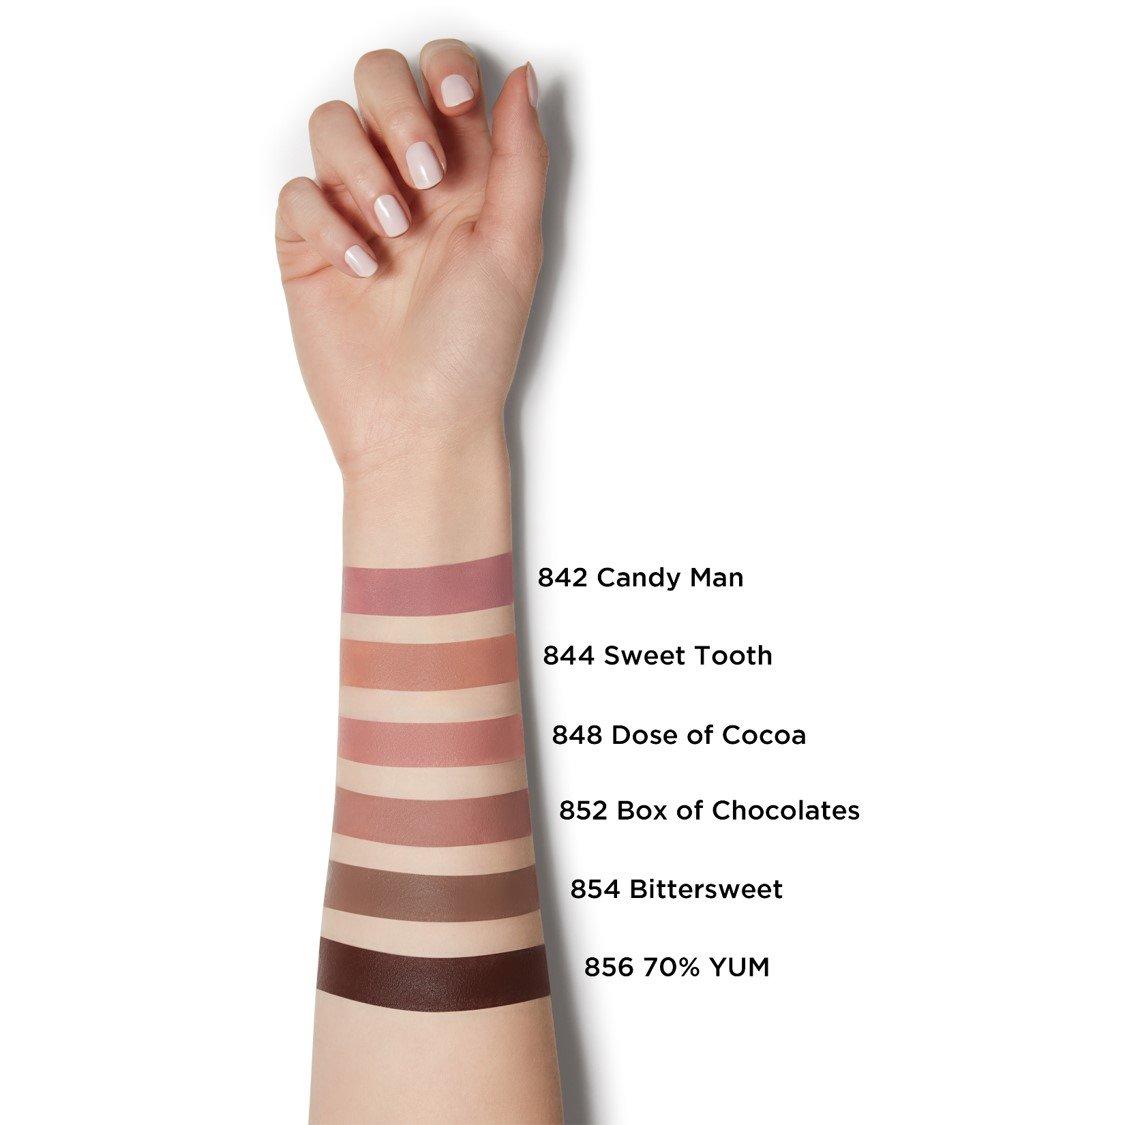 6c0ca44ef3c Amazon.com : L'Oreal Paris Cosmetics Infallible Pro Matte Les Chocolats  Scented Liquid Lipstick, Dose of Cocoa, 0.21 Fluid Ounce : Beauty